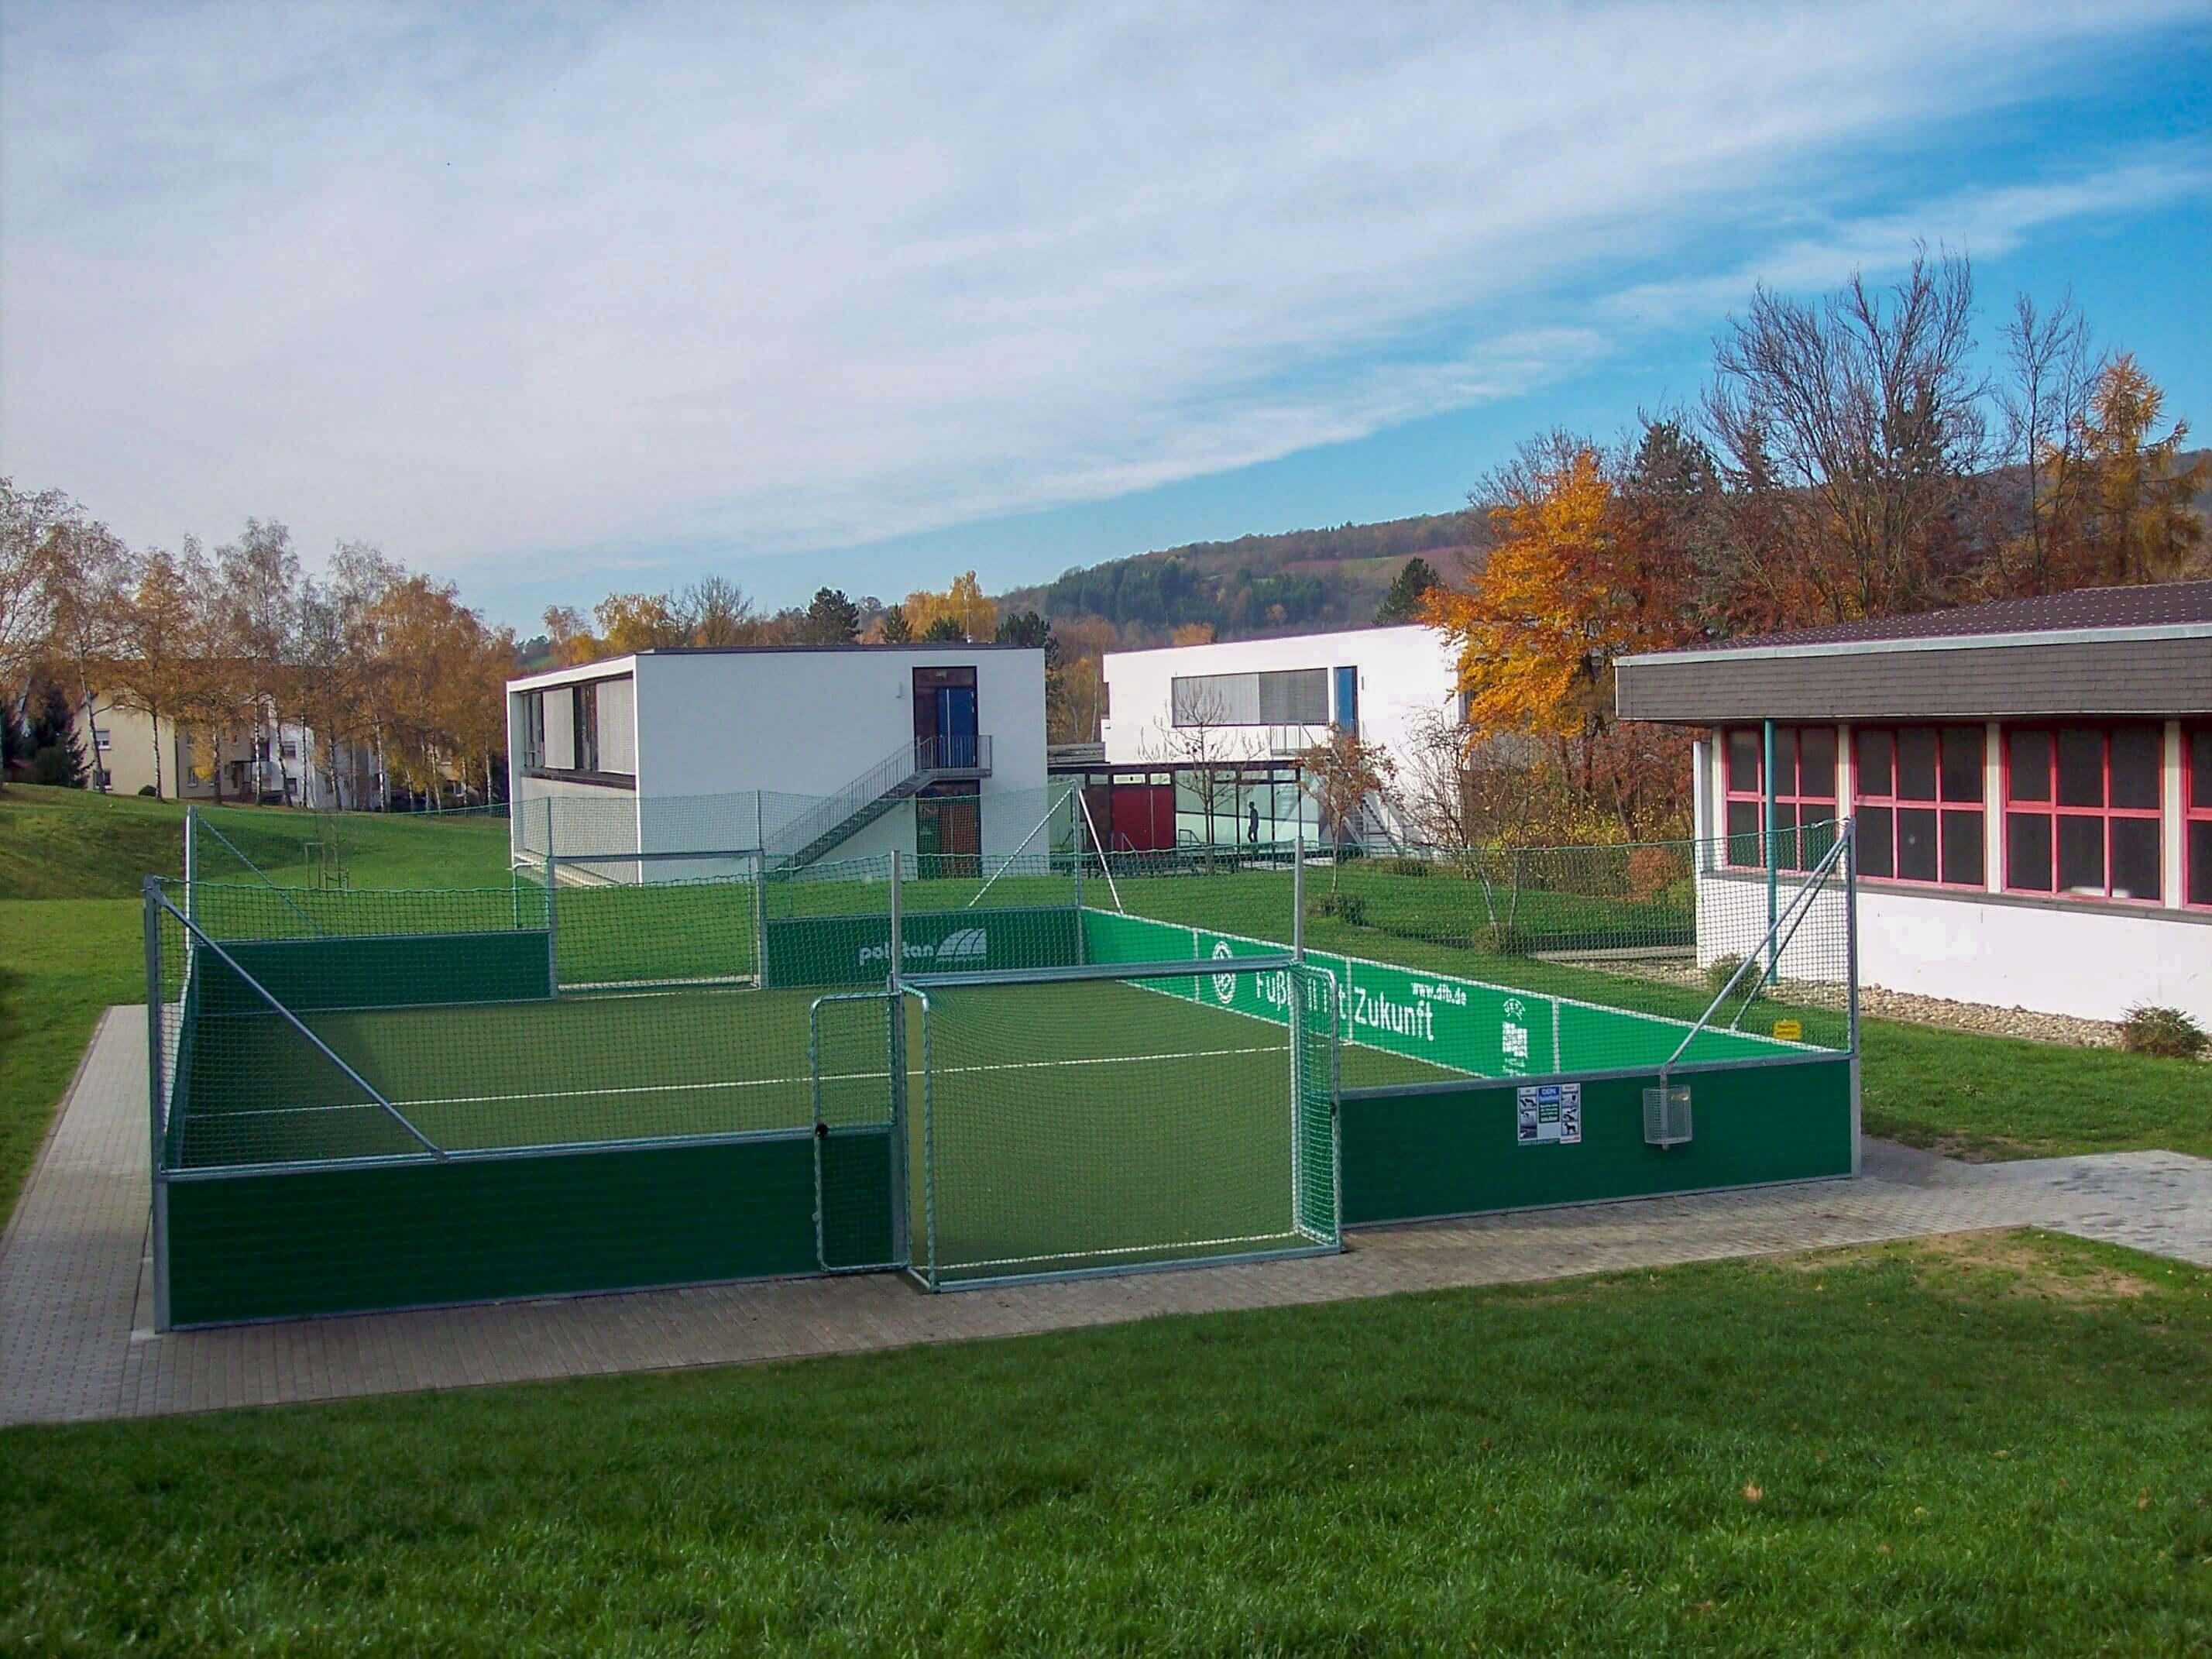 Soccerfeld mit Schule